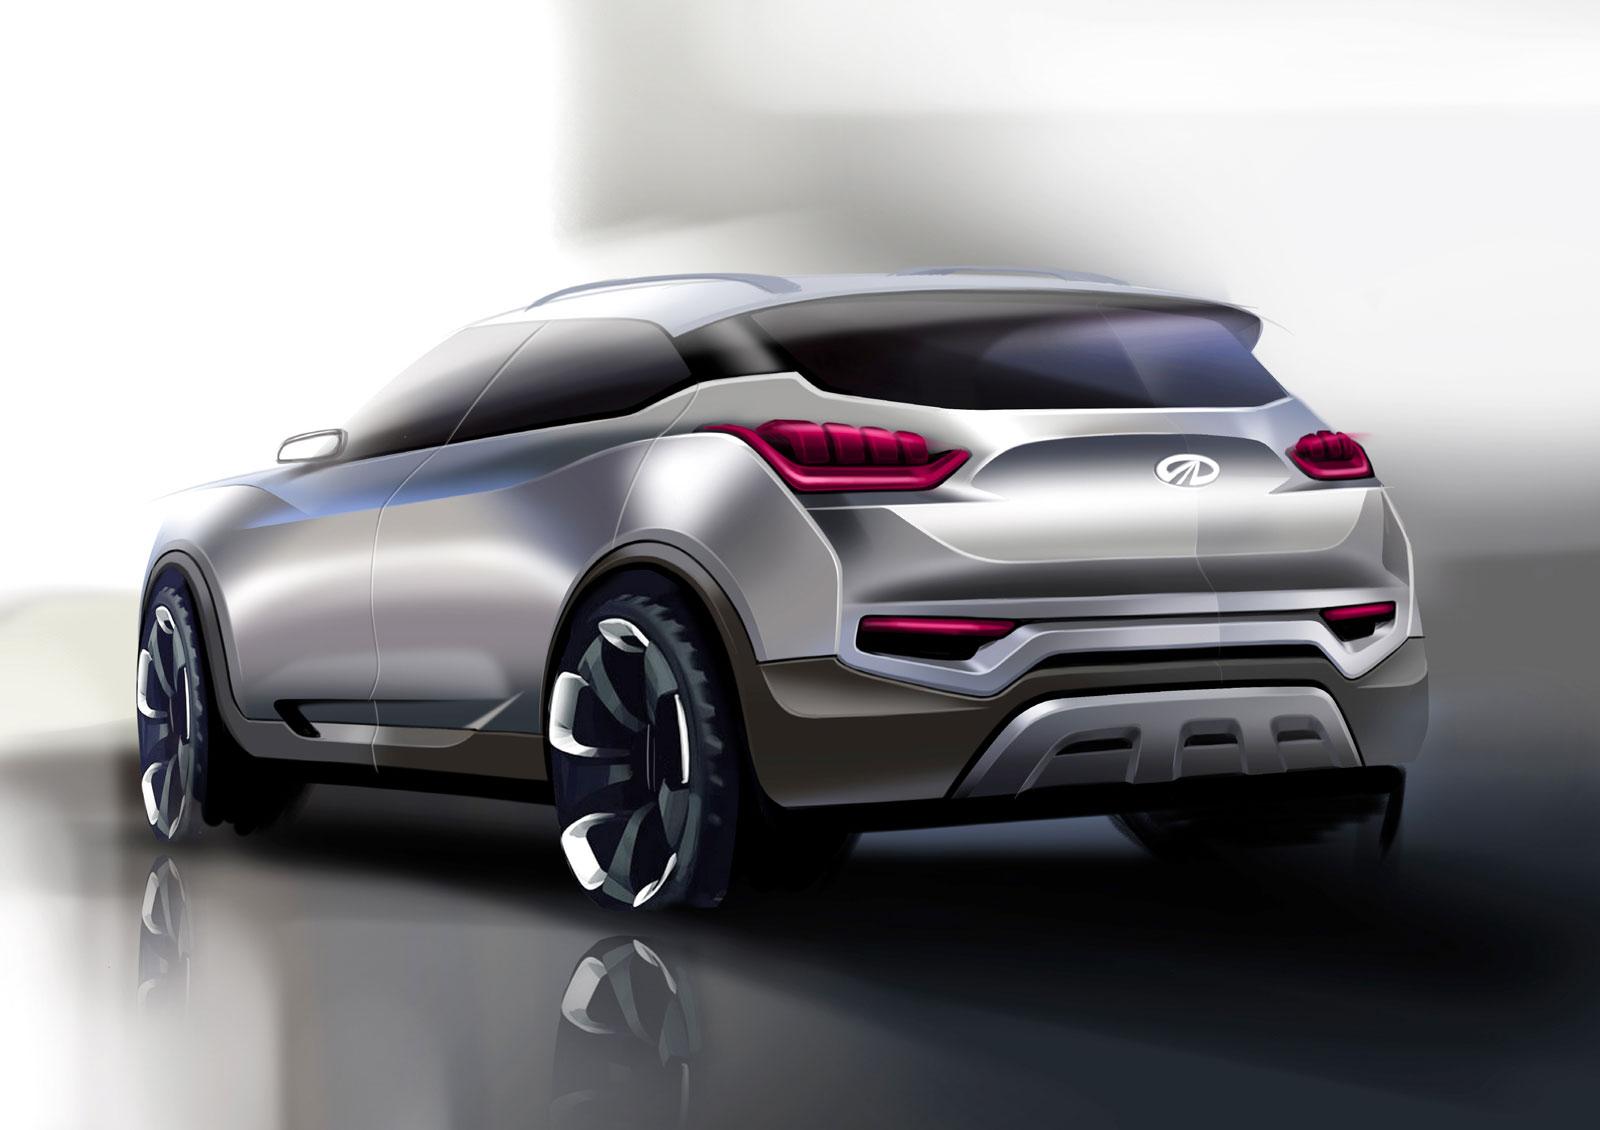 Mahindra XUV300 Design Sketch Render - Car Body Design